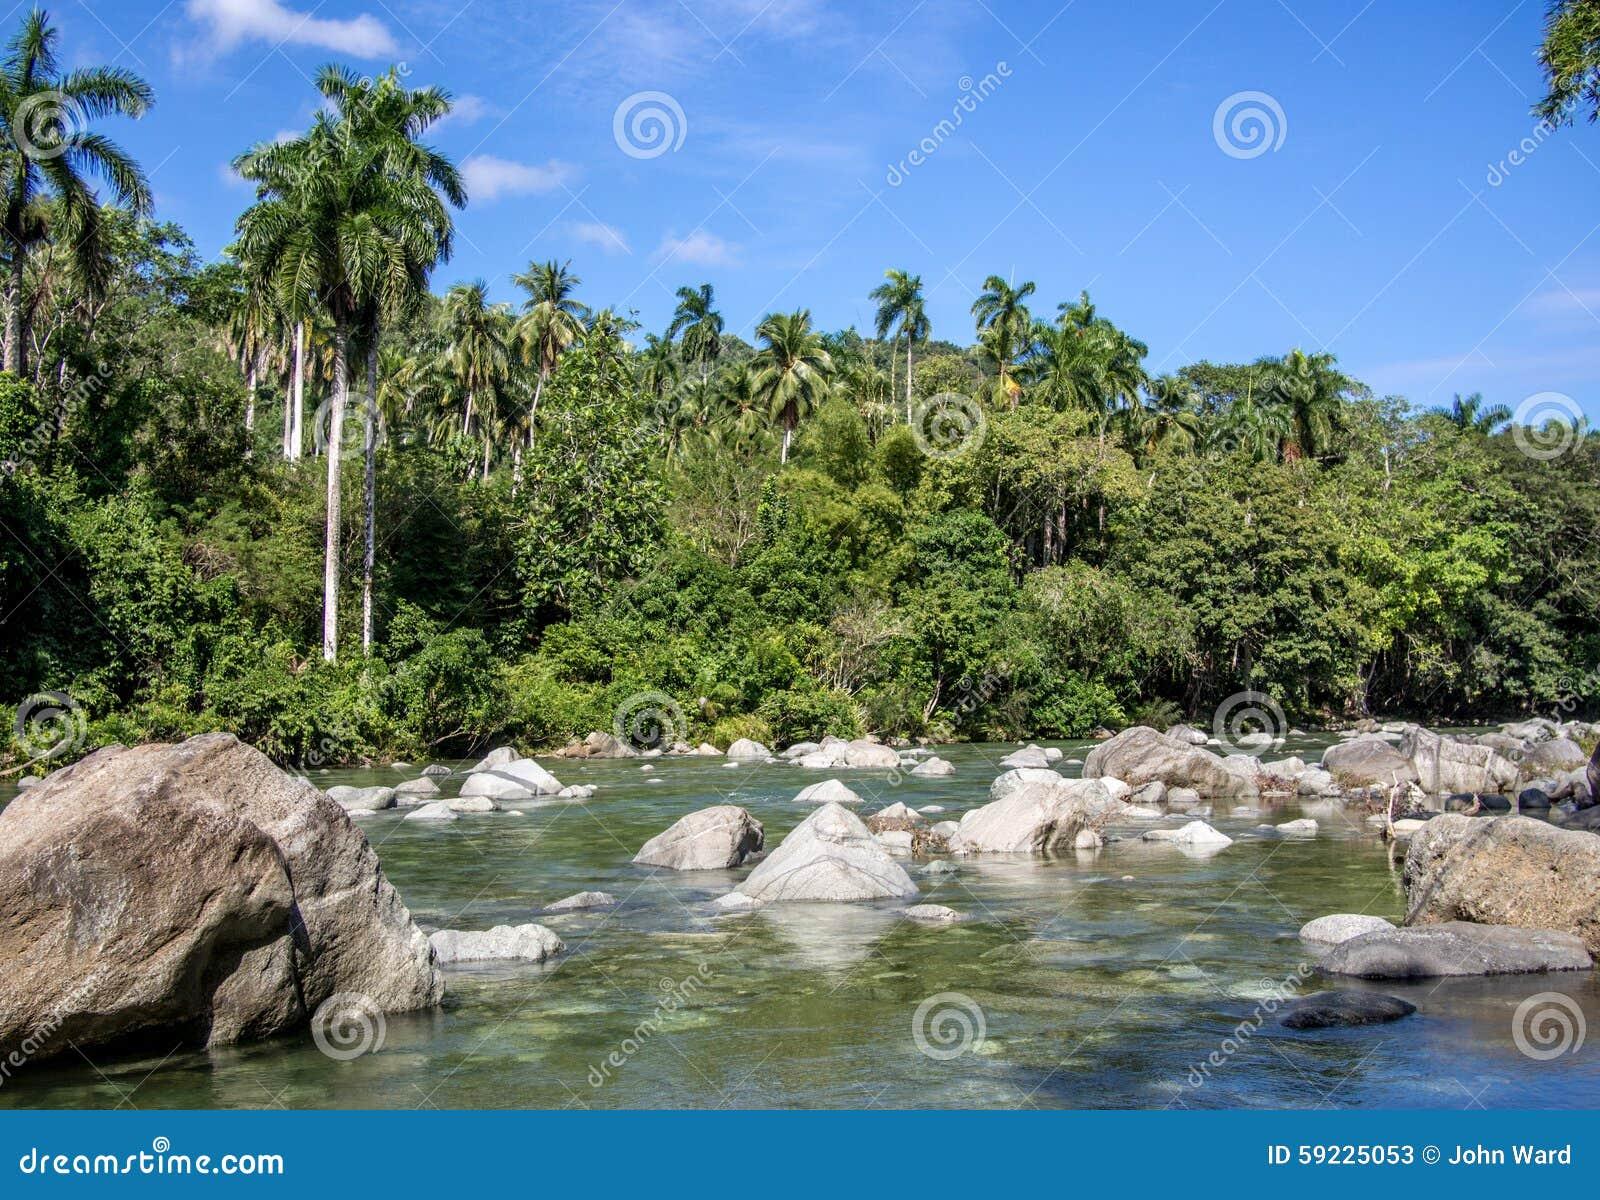 Download Río Duaba Baracoa Cuba imagen de archivo. Imagen de cuba - 59225053